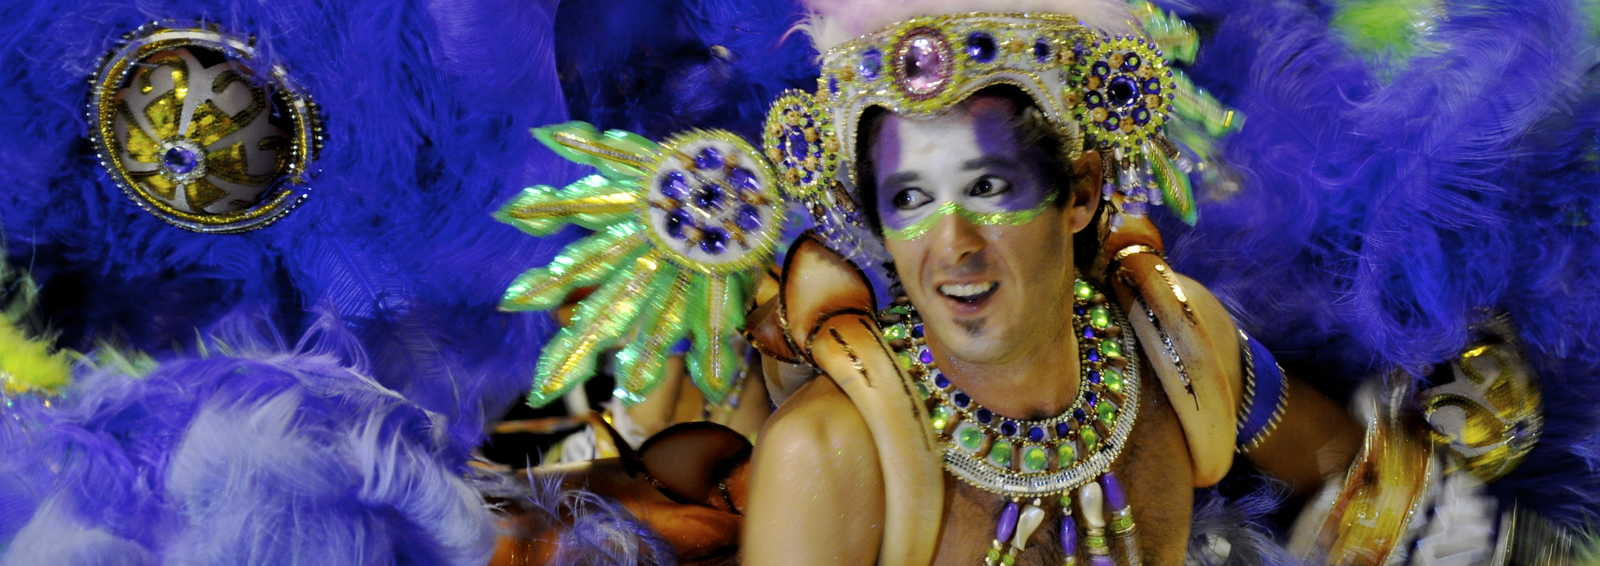 Carnival at Gualyguachu in Argentina